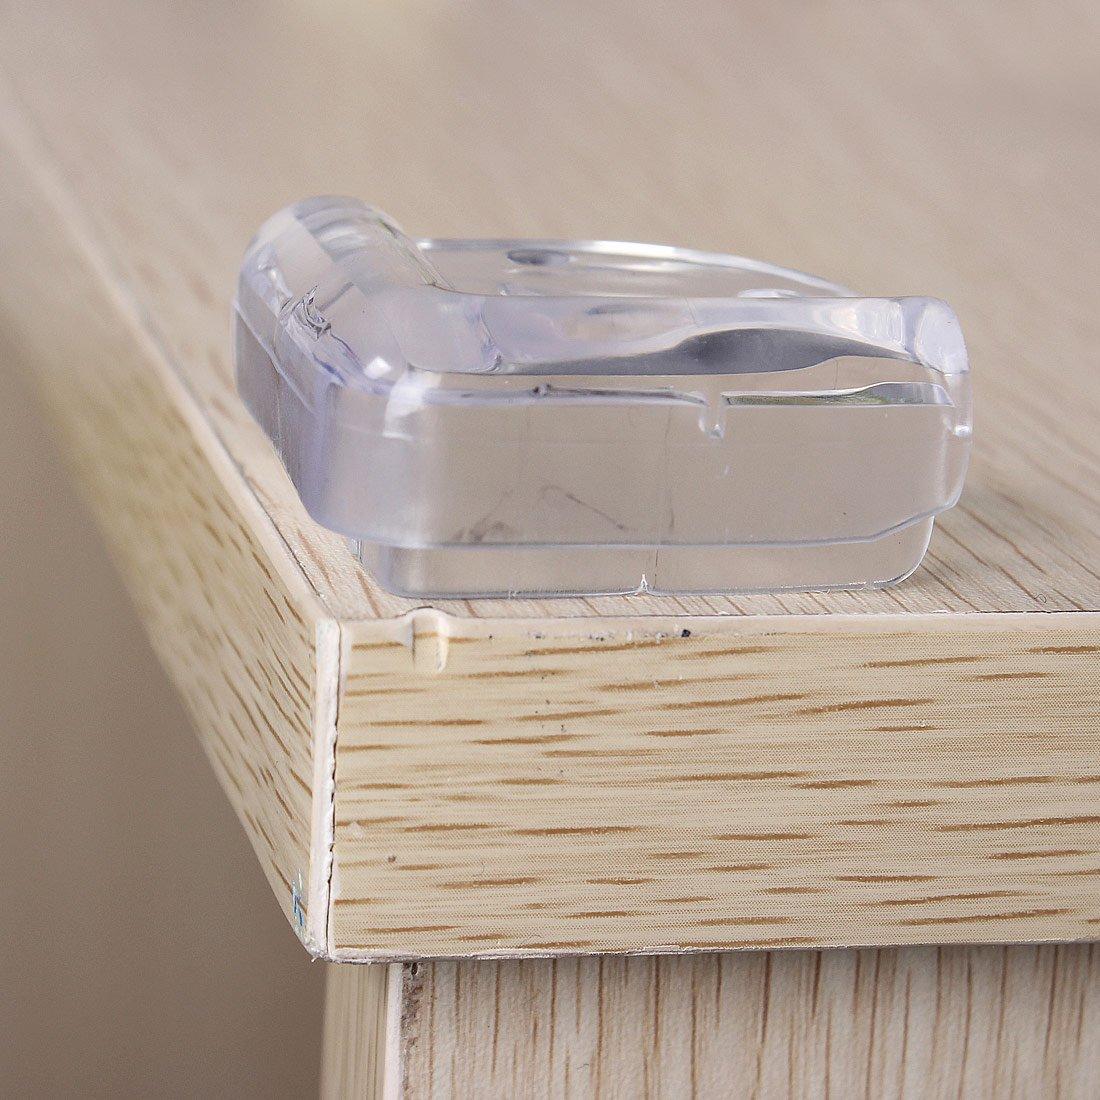 8pcs kantenschutz eckenschutz kinder soft. Black Bedroom Furniture Sets. Home Design Ideas